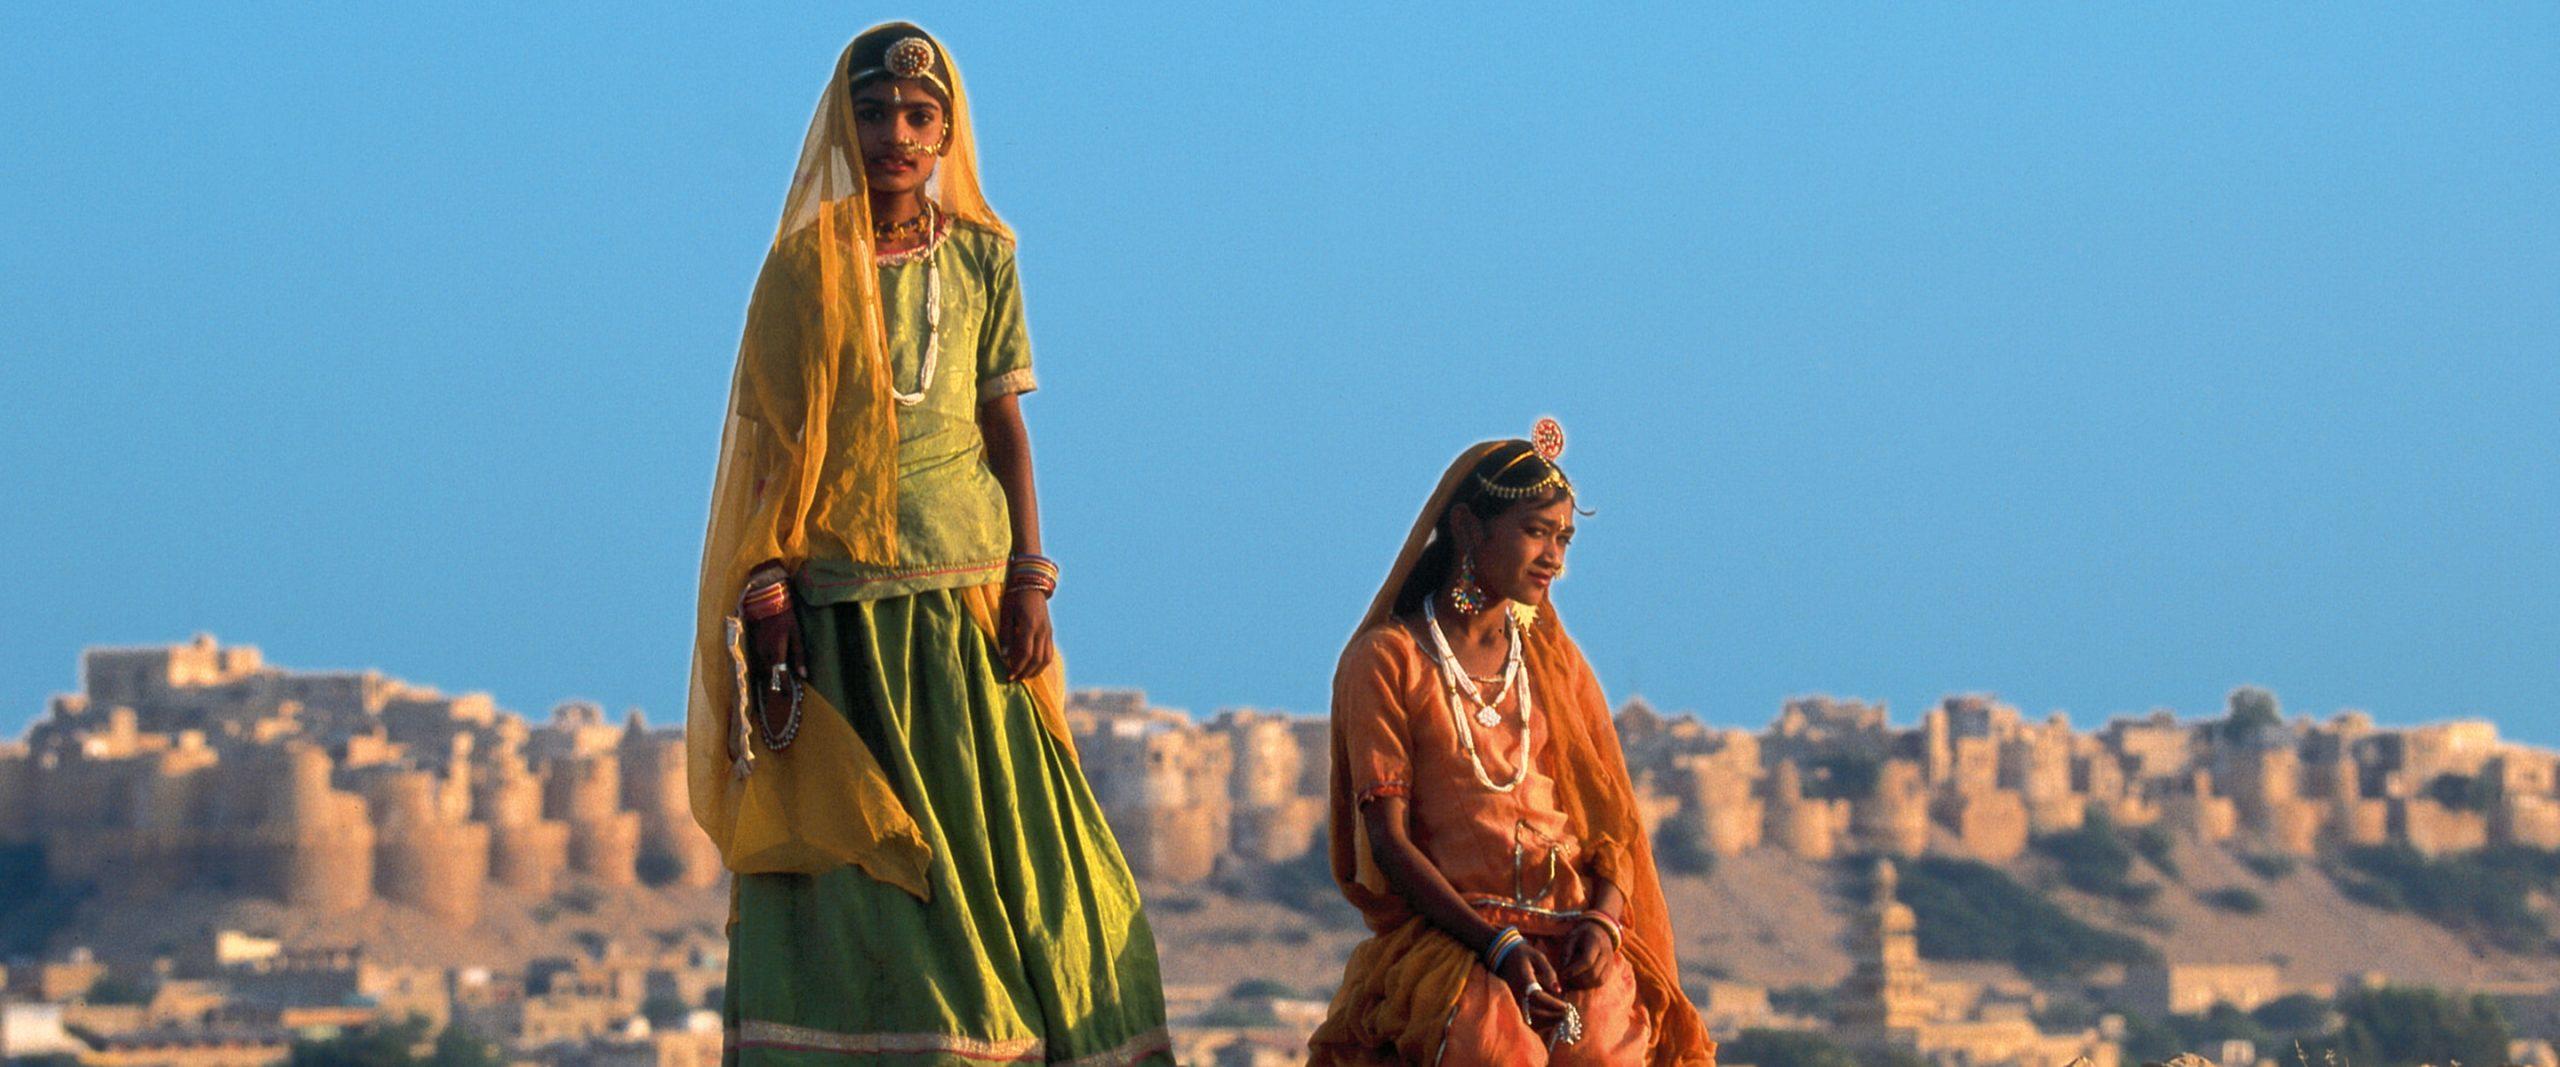 Gruppenreise Indien - Kultur Saris